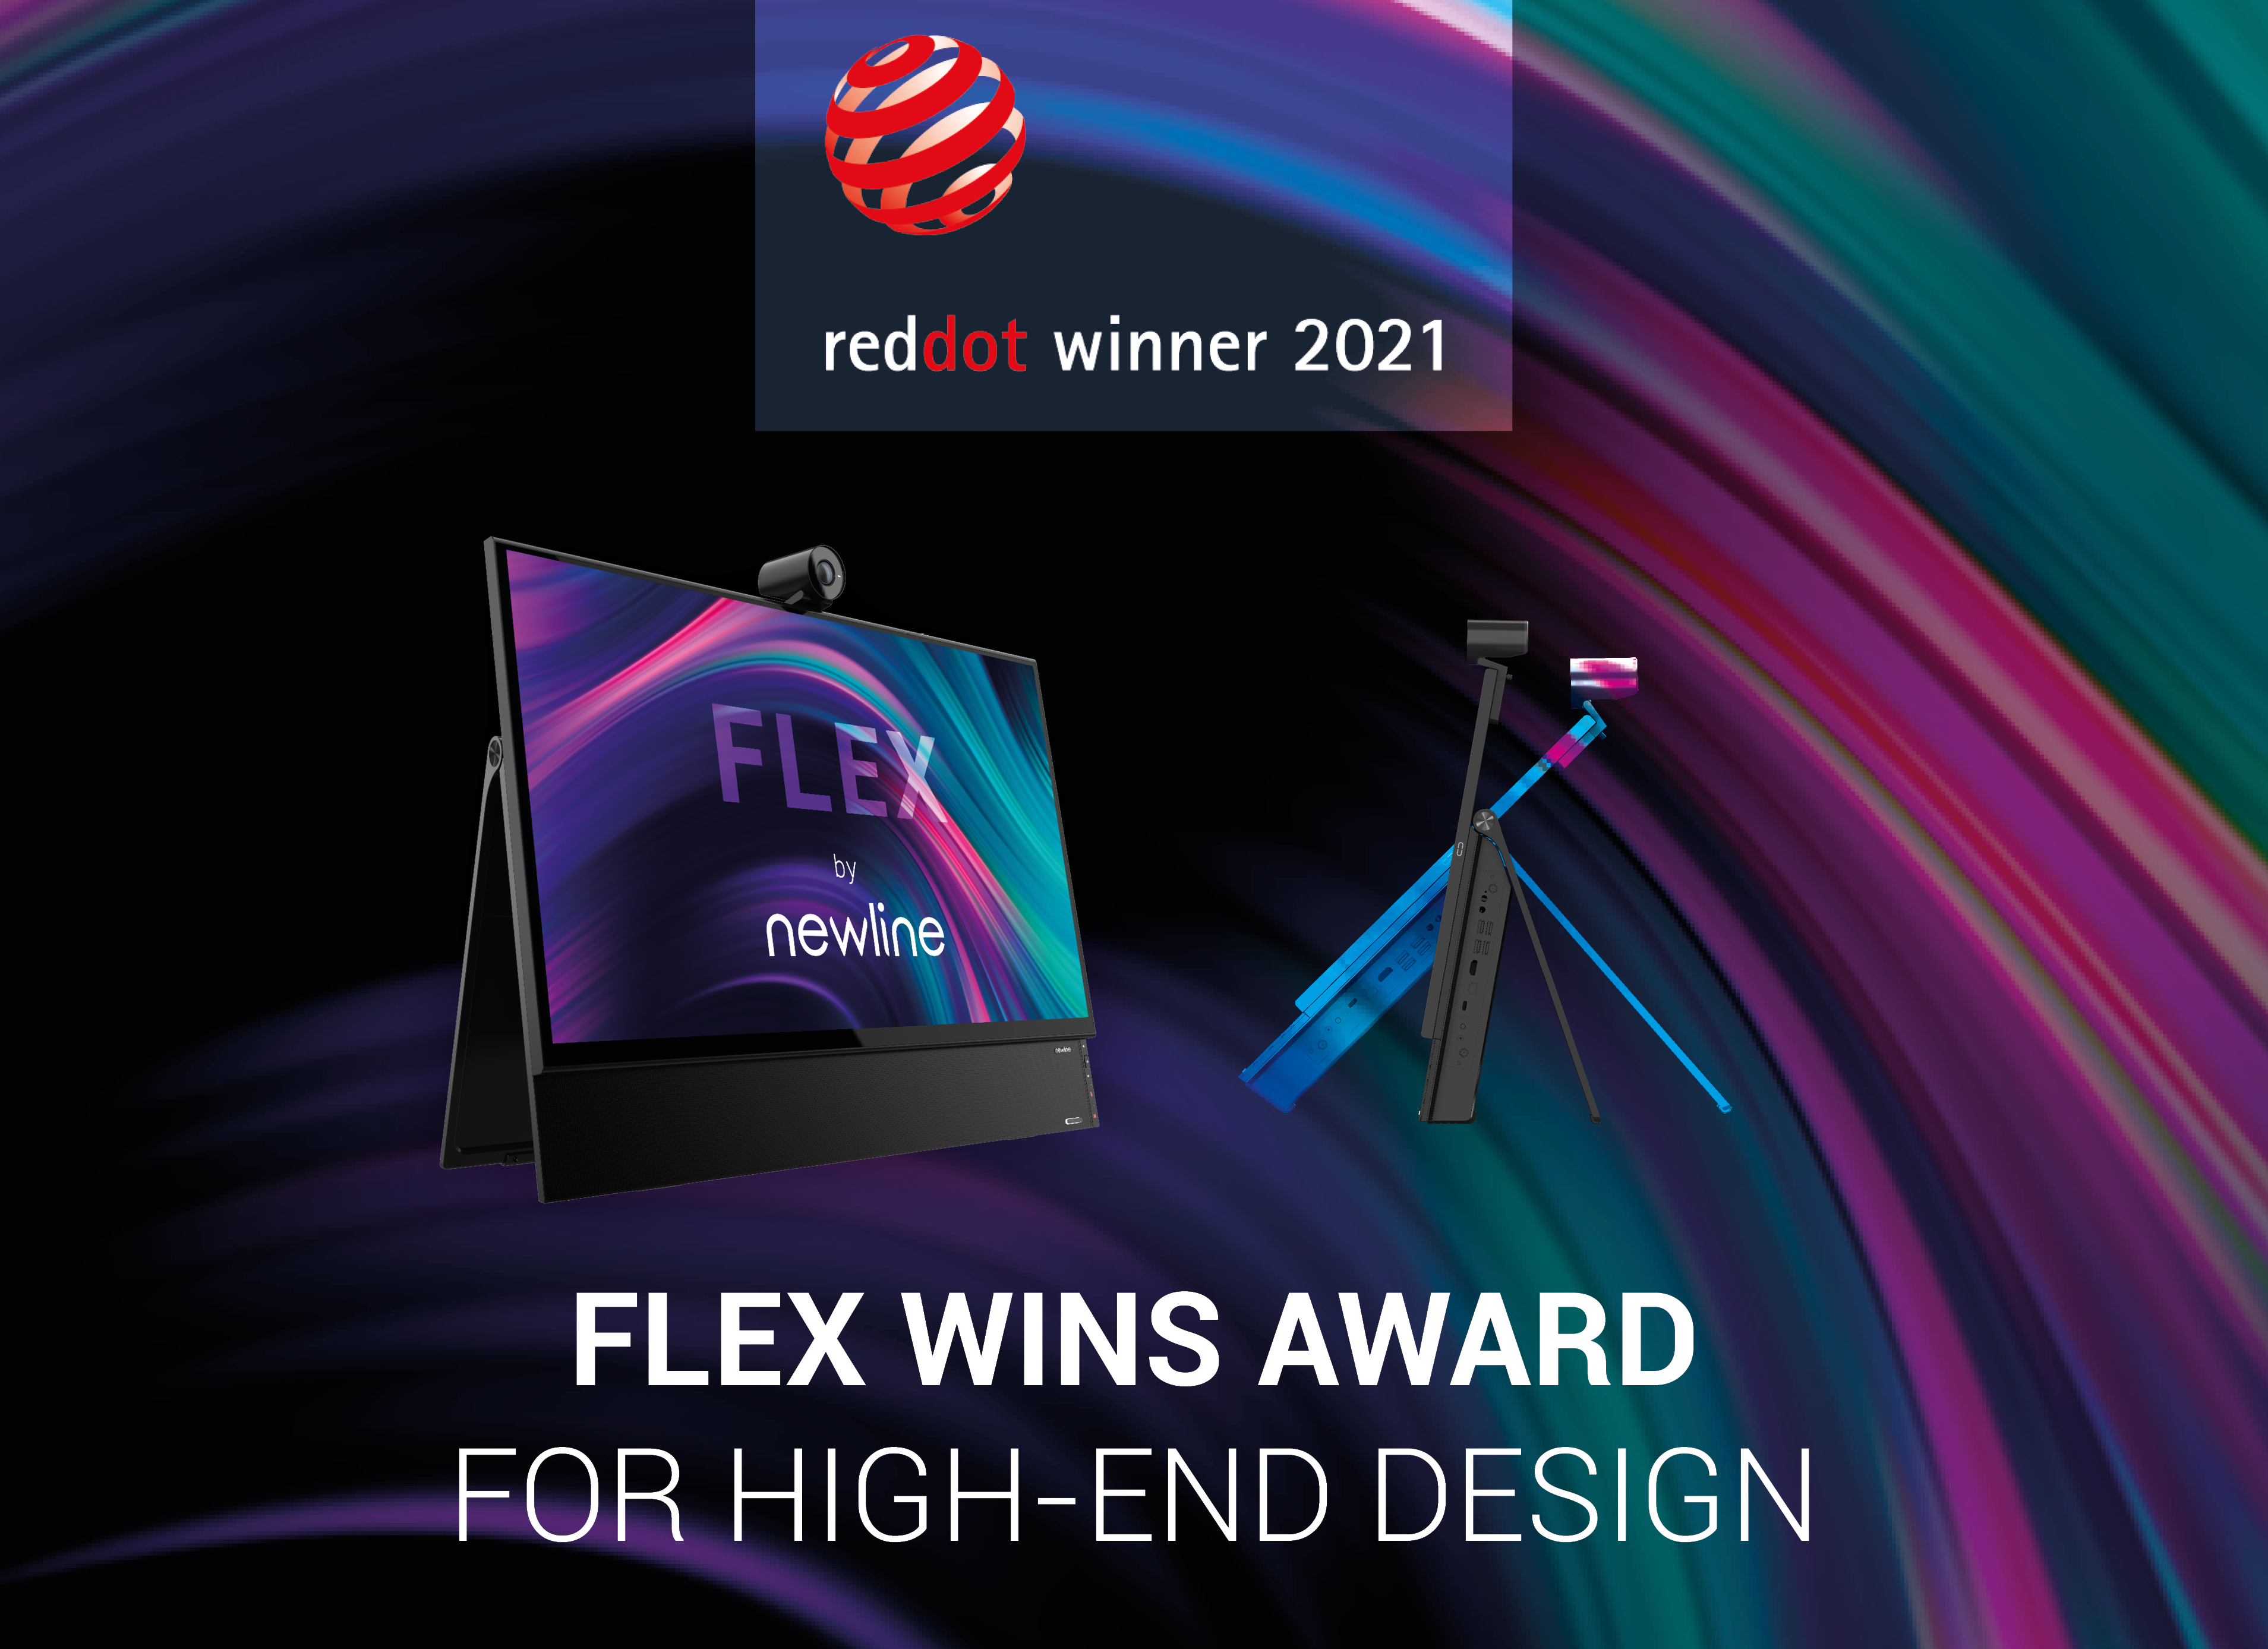 Flex Wins Red Dot Award for High-End Design